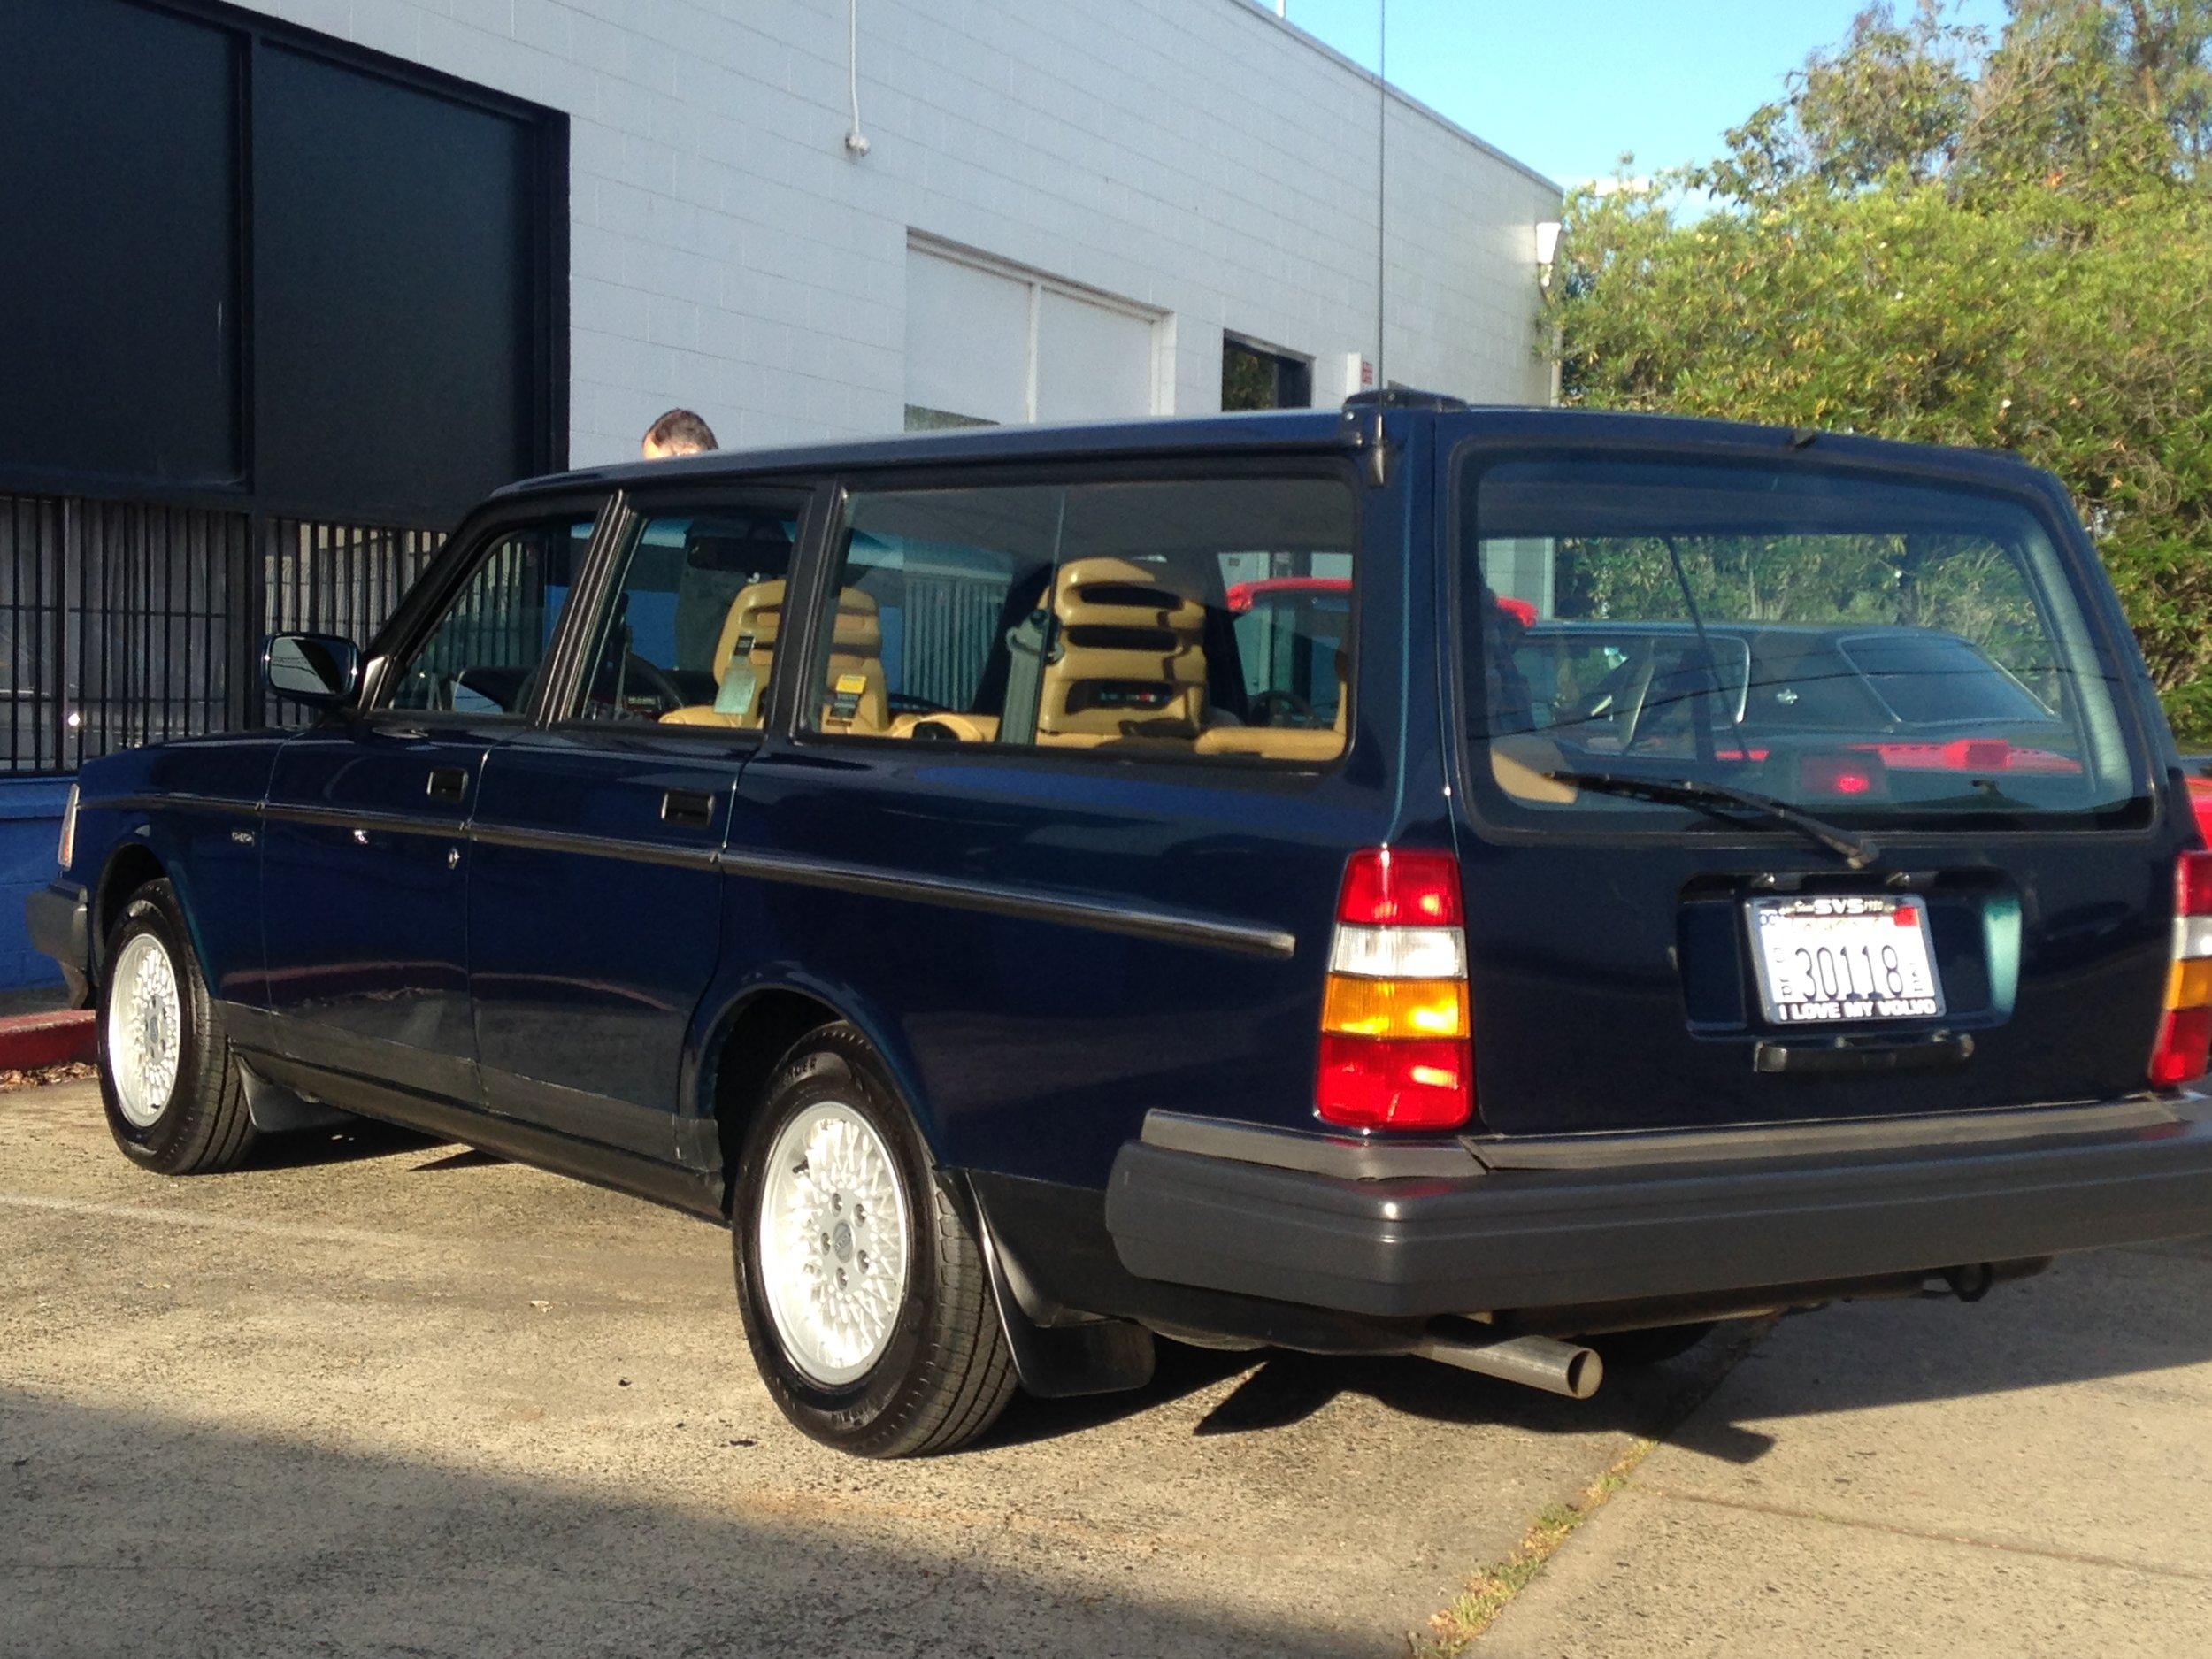 1993 Limited Edition 240 Wagon, #1598/1600